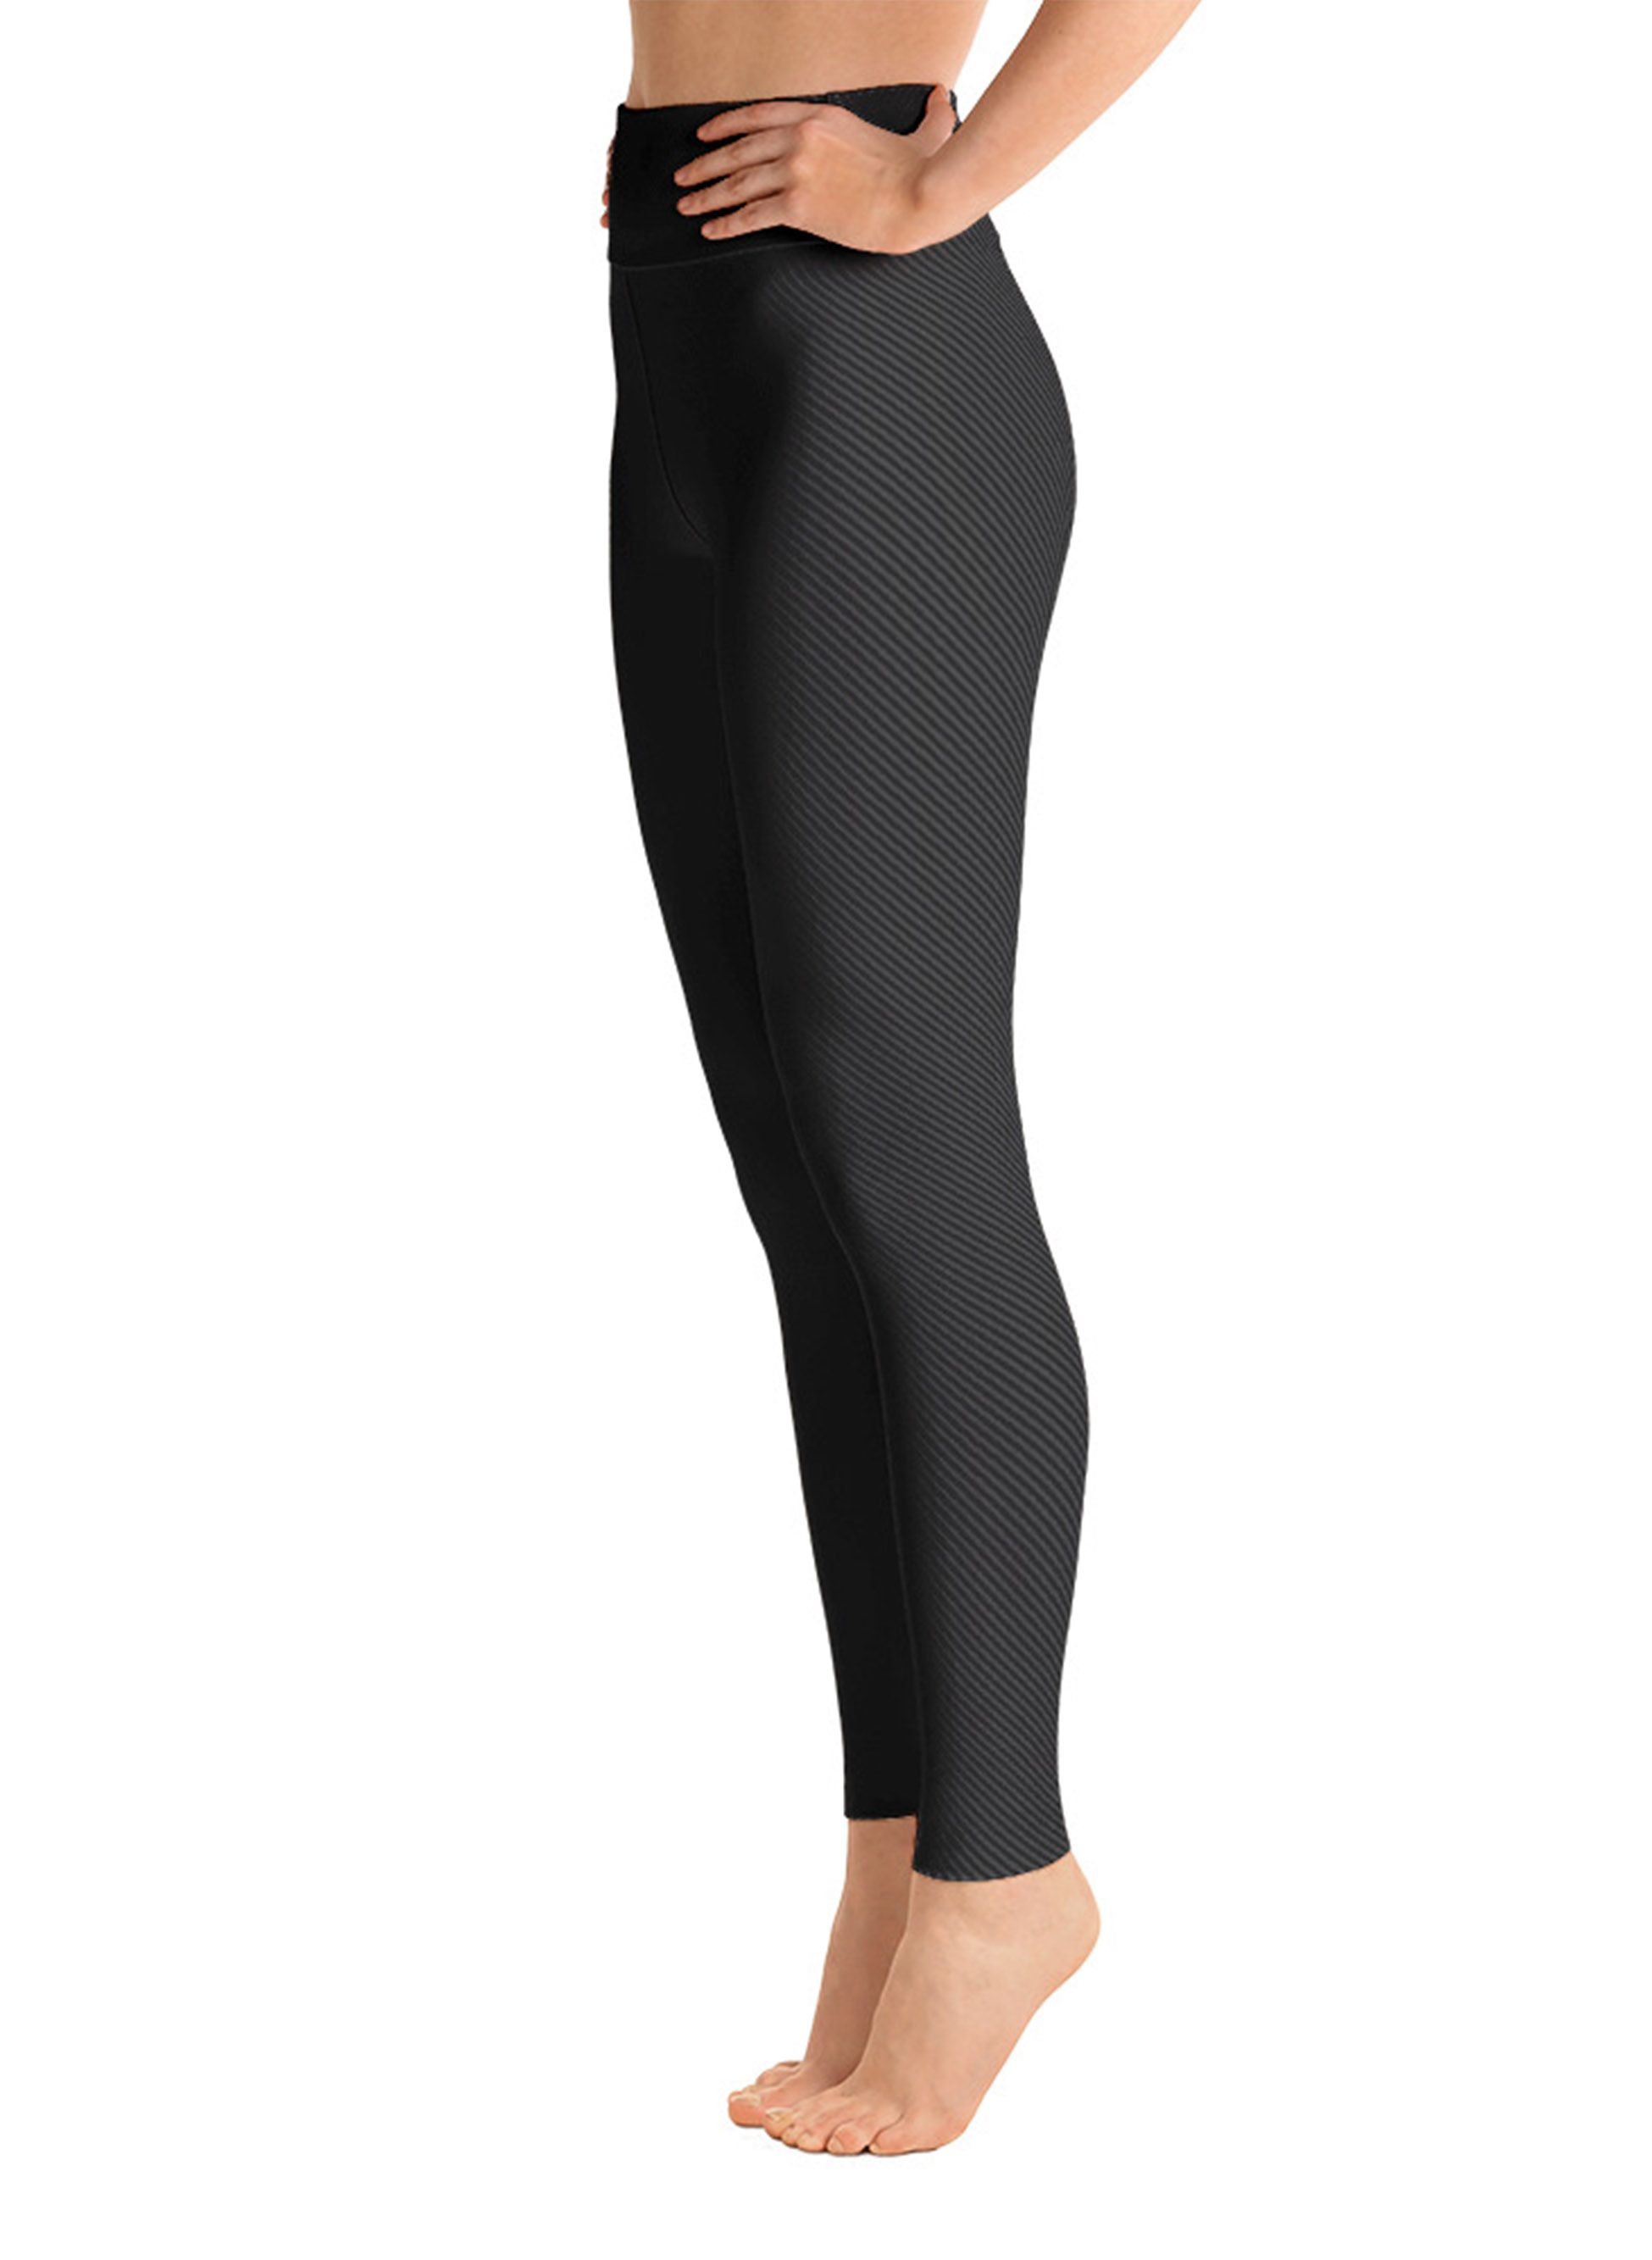 4e4ba19b67c257 Carbon-Fiber Pattern Yoga Leggings. Super soft, stretchy and comfortable yoga  leggings. • 82% polyester/18% spandex